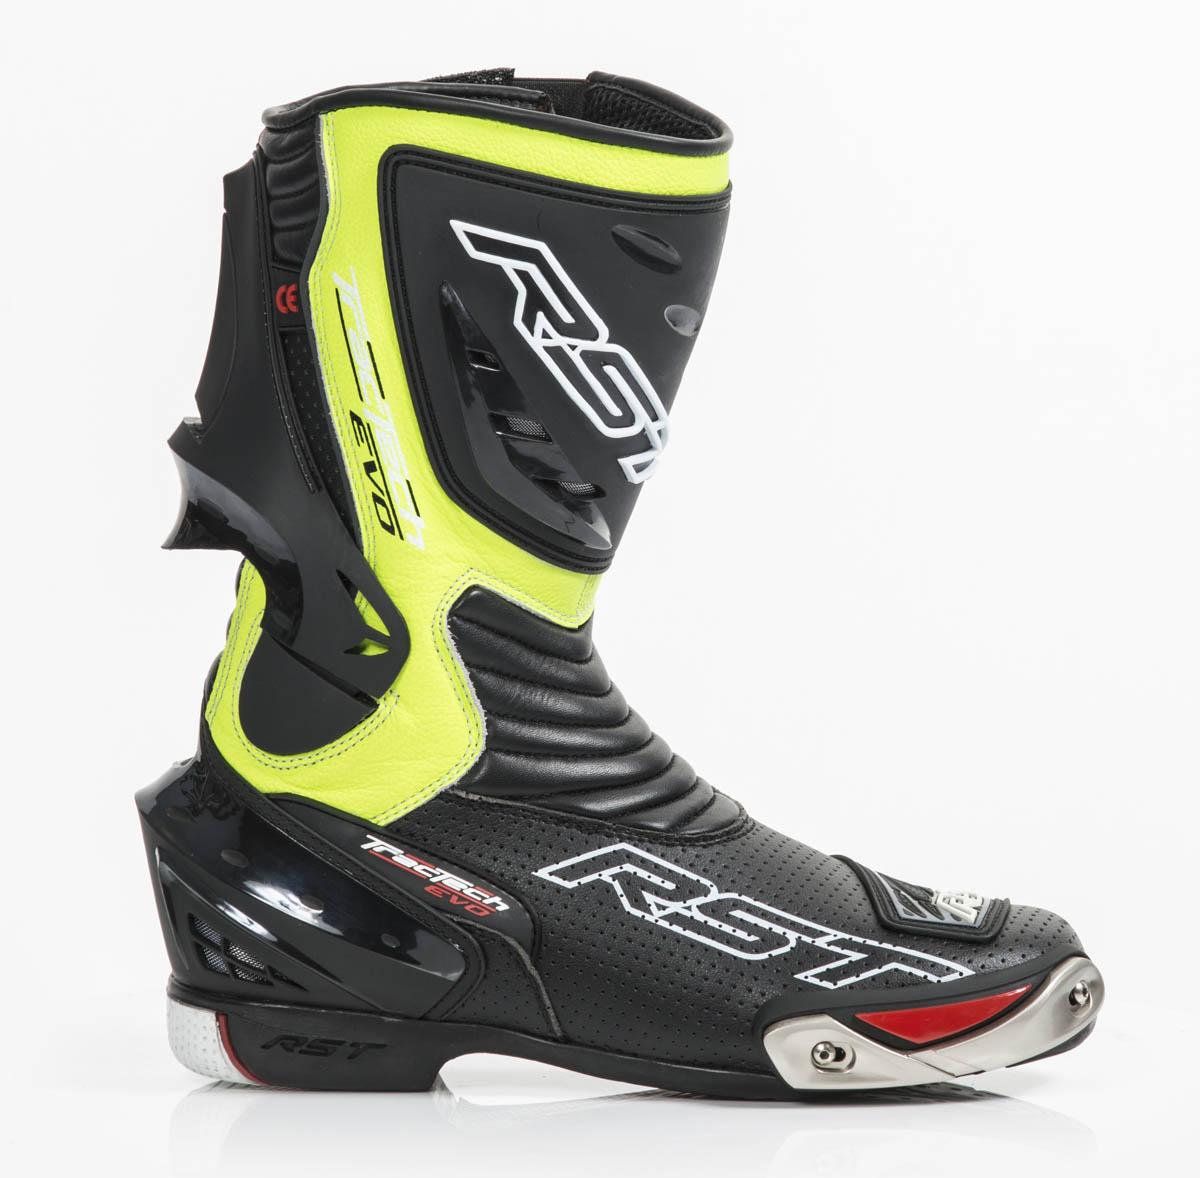 【RST】RST 1516 TRACTECH EVO SPORT CE 車靴 - 「Webike-摩托百貨」